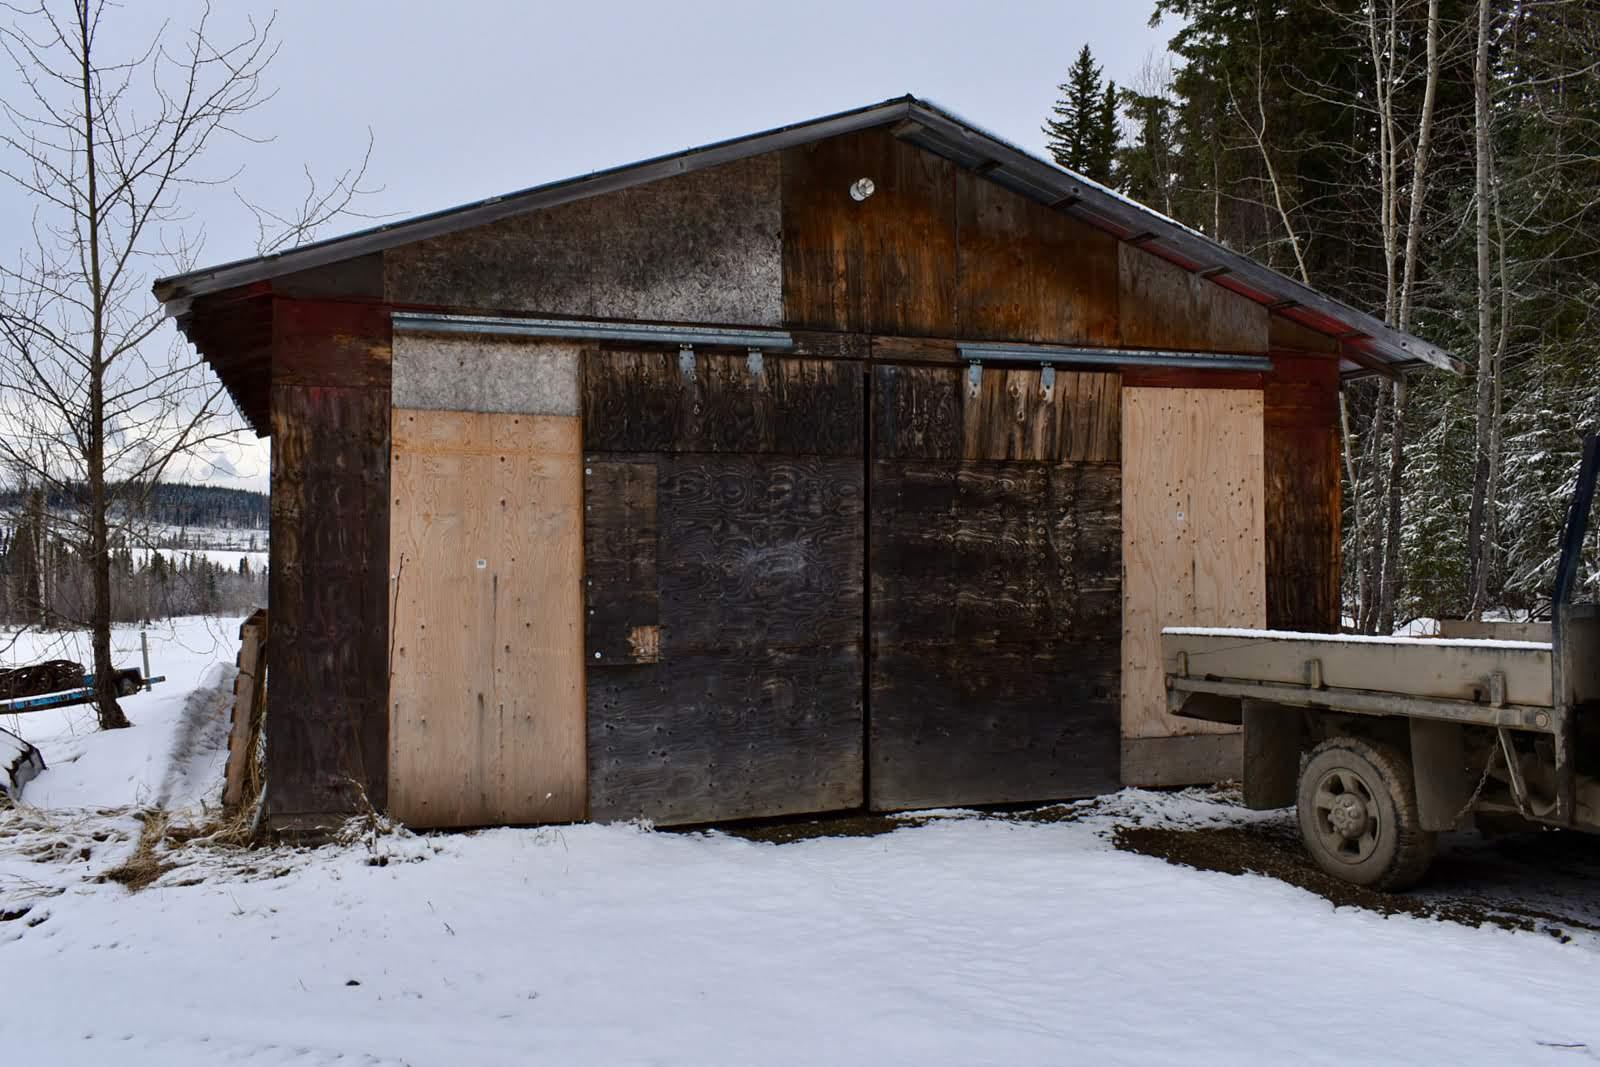 Quesnel-Hixon Road, Quesnel, British Columbia    - Photo 9 - RP3180632378